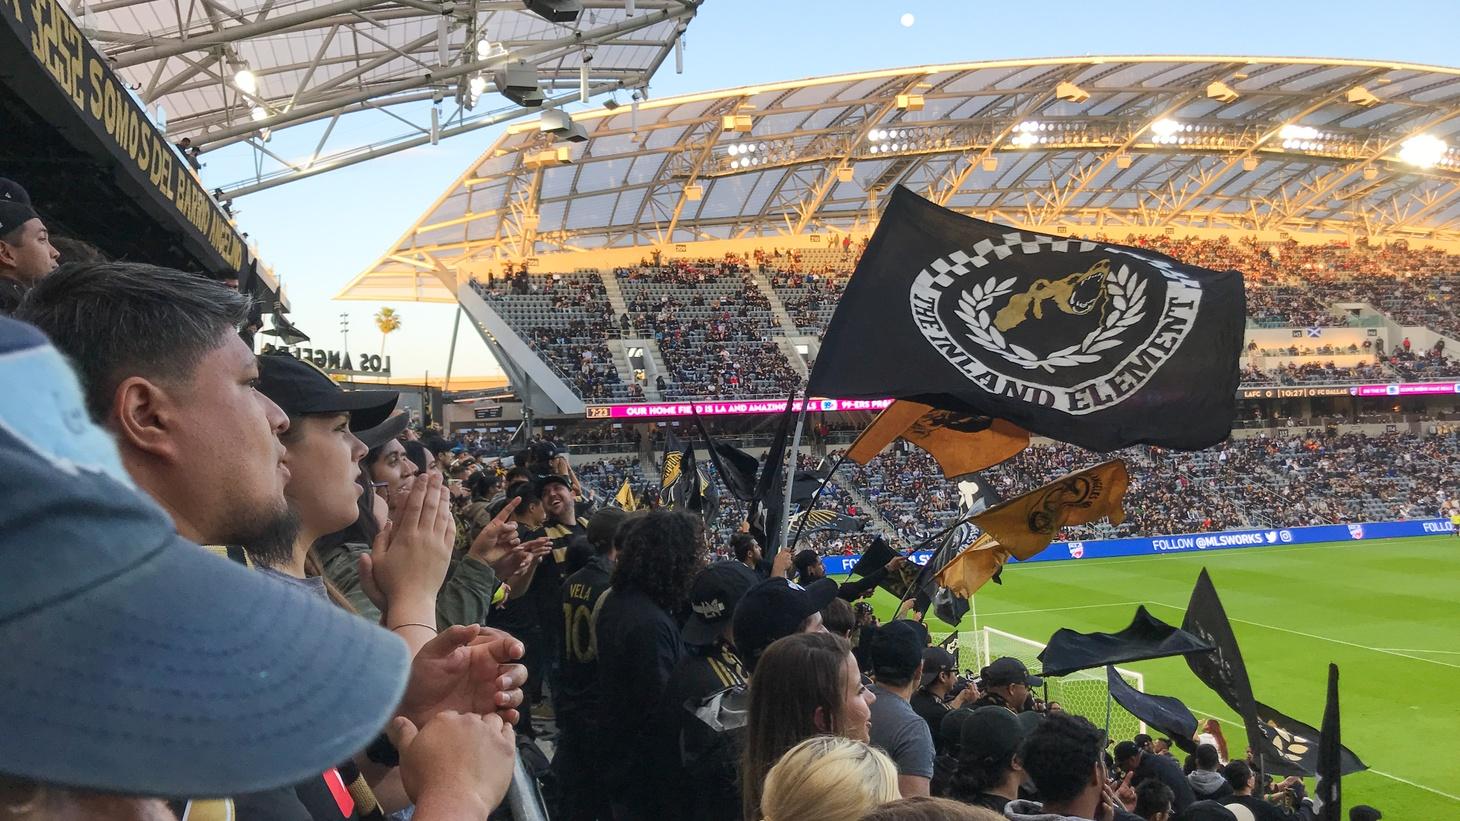 Spectators at a recent LAFC game.